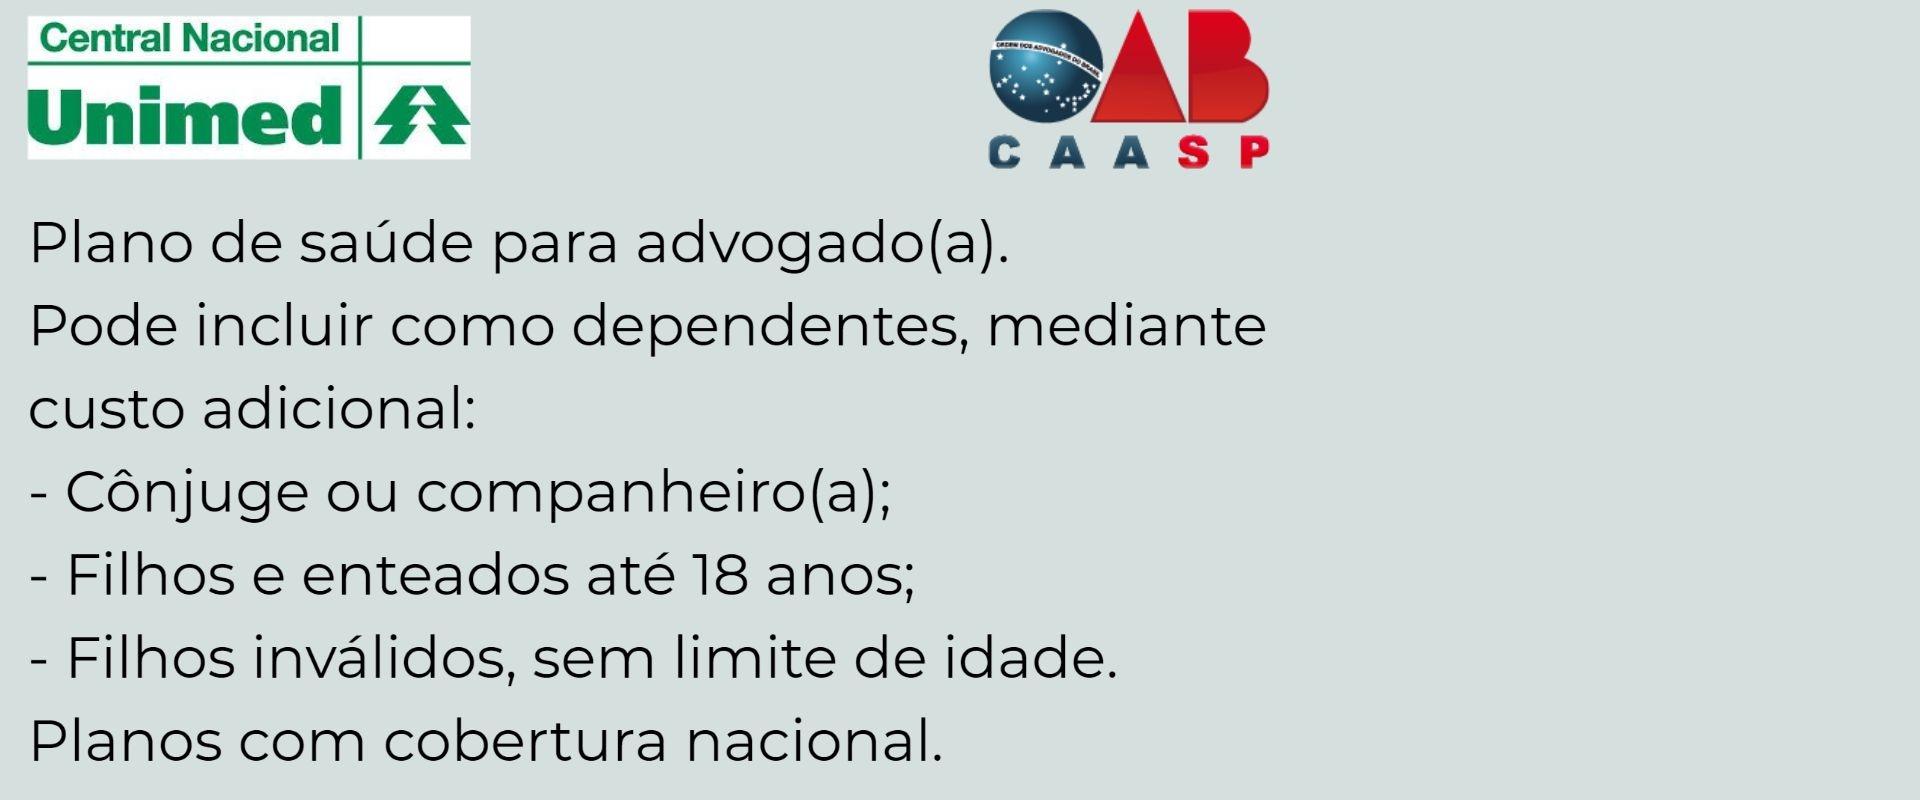 Unimed CAASP São Carlos